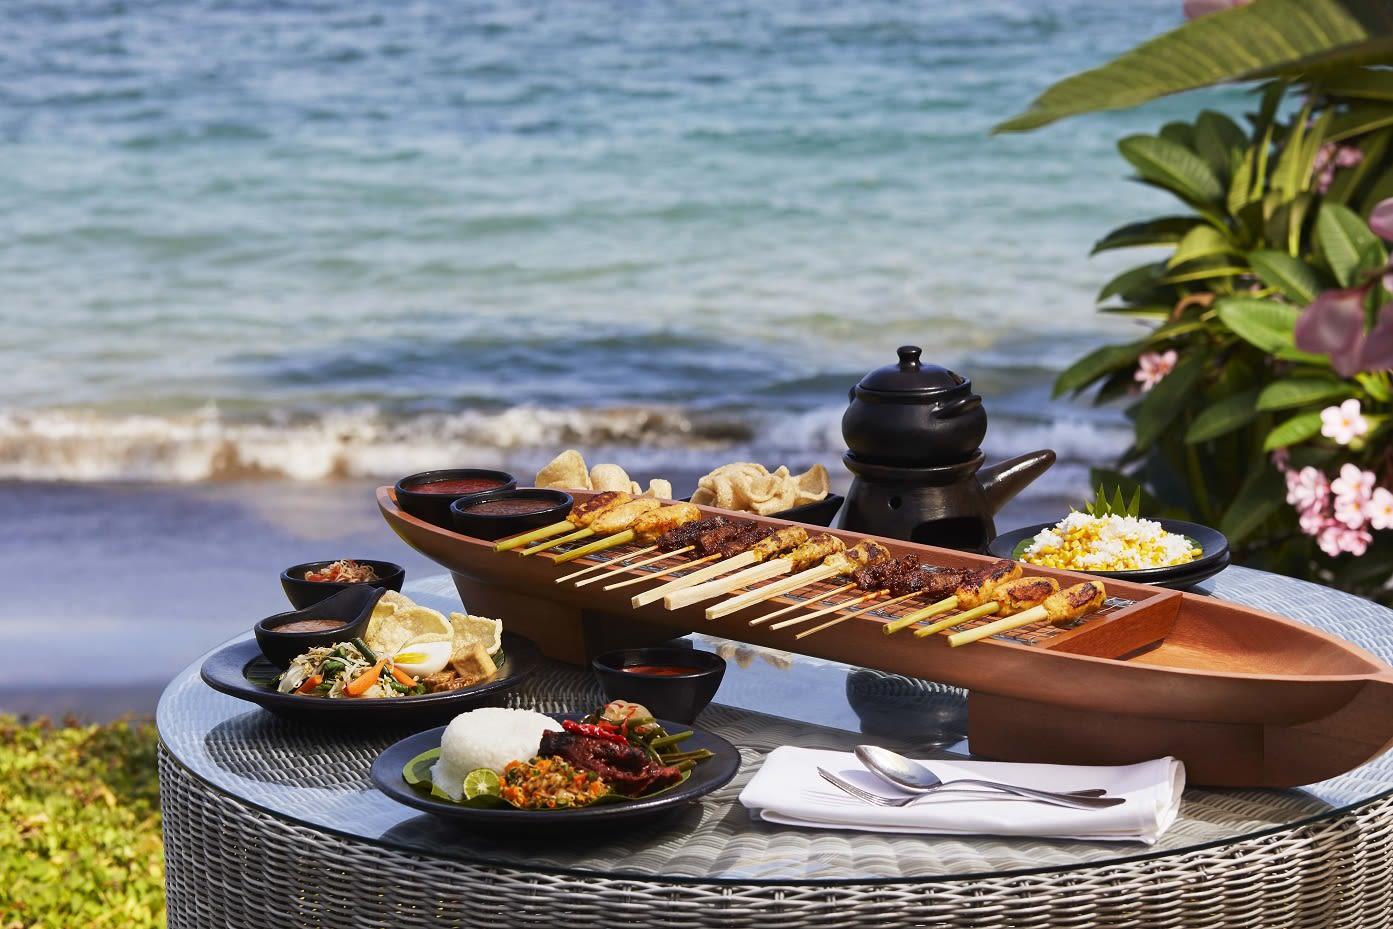 F&B Voucher Sheraton Senggigi Beach Resort - F&B Credit Voucher value Rp. 750,000,-